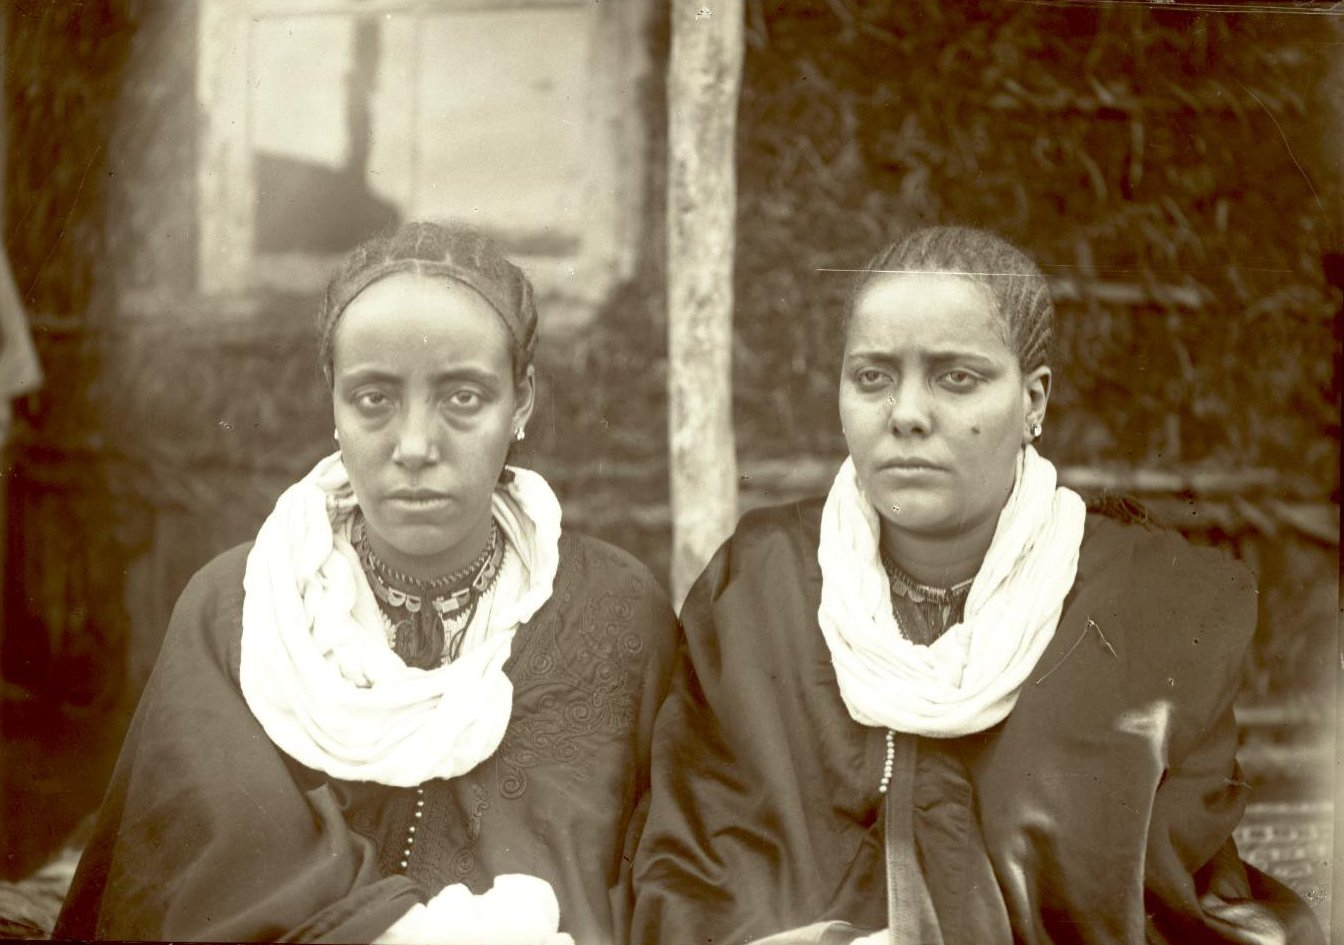 394. 1899. Абиссиния, Аддис-Абеба. Жены фитаурари Ульде Георгиса и раса Тассама Дарга